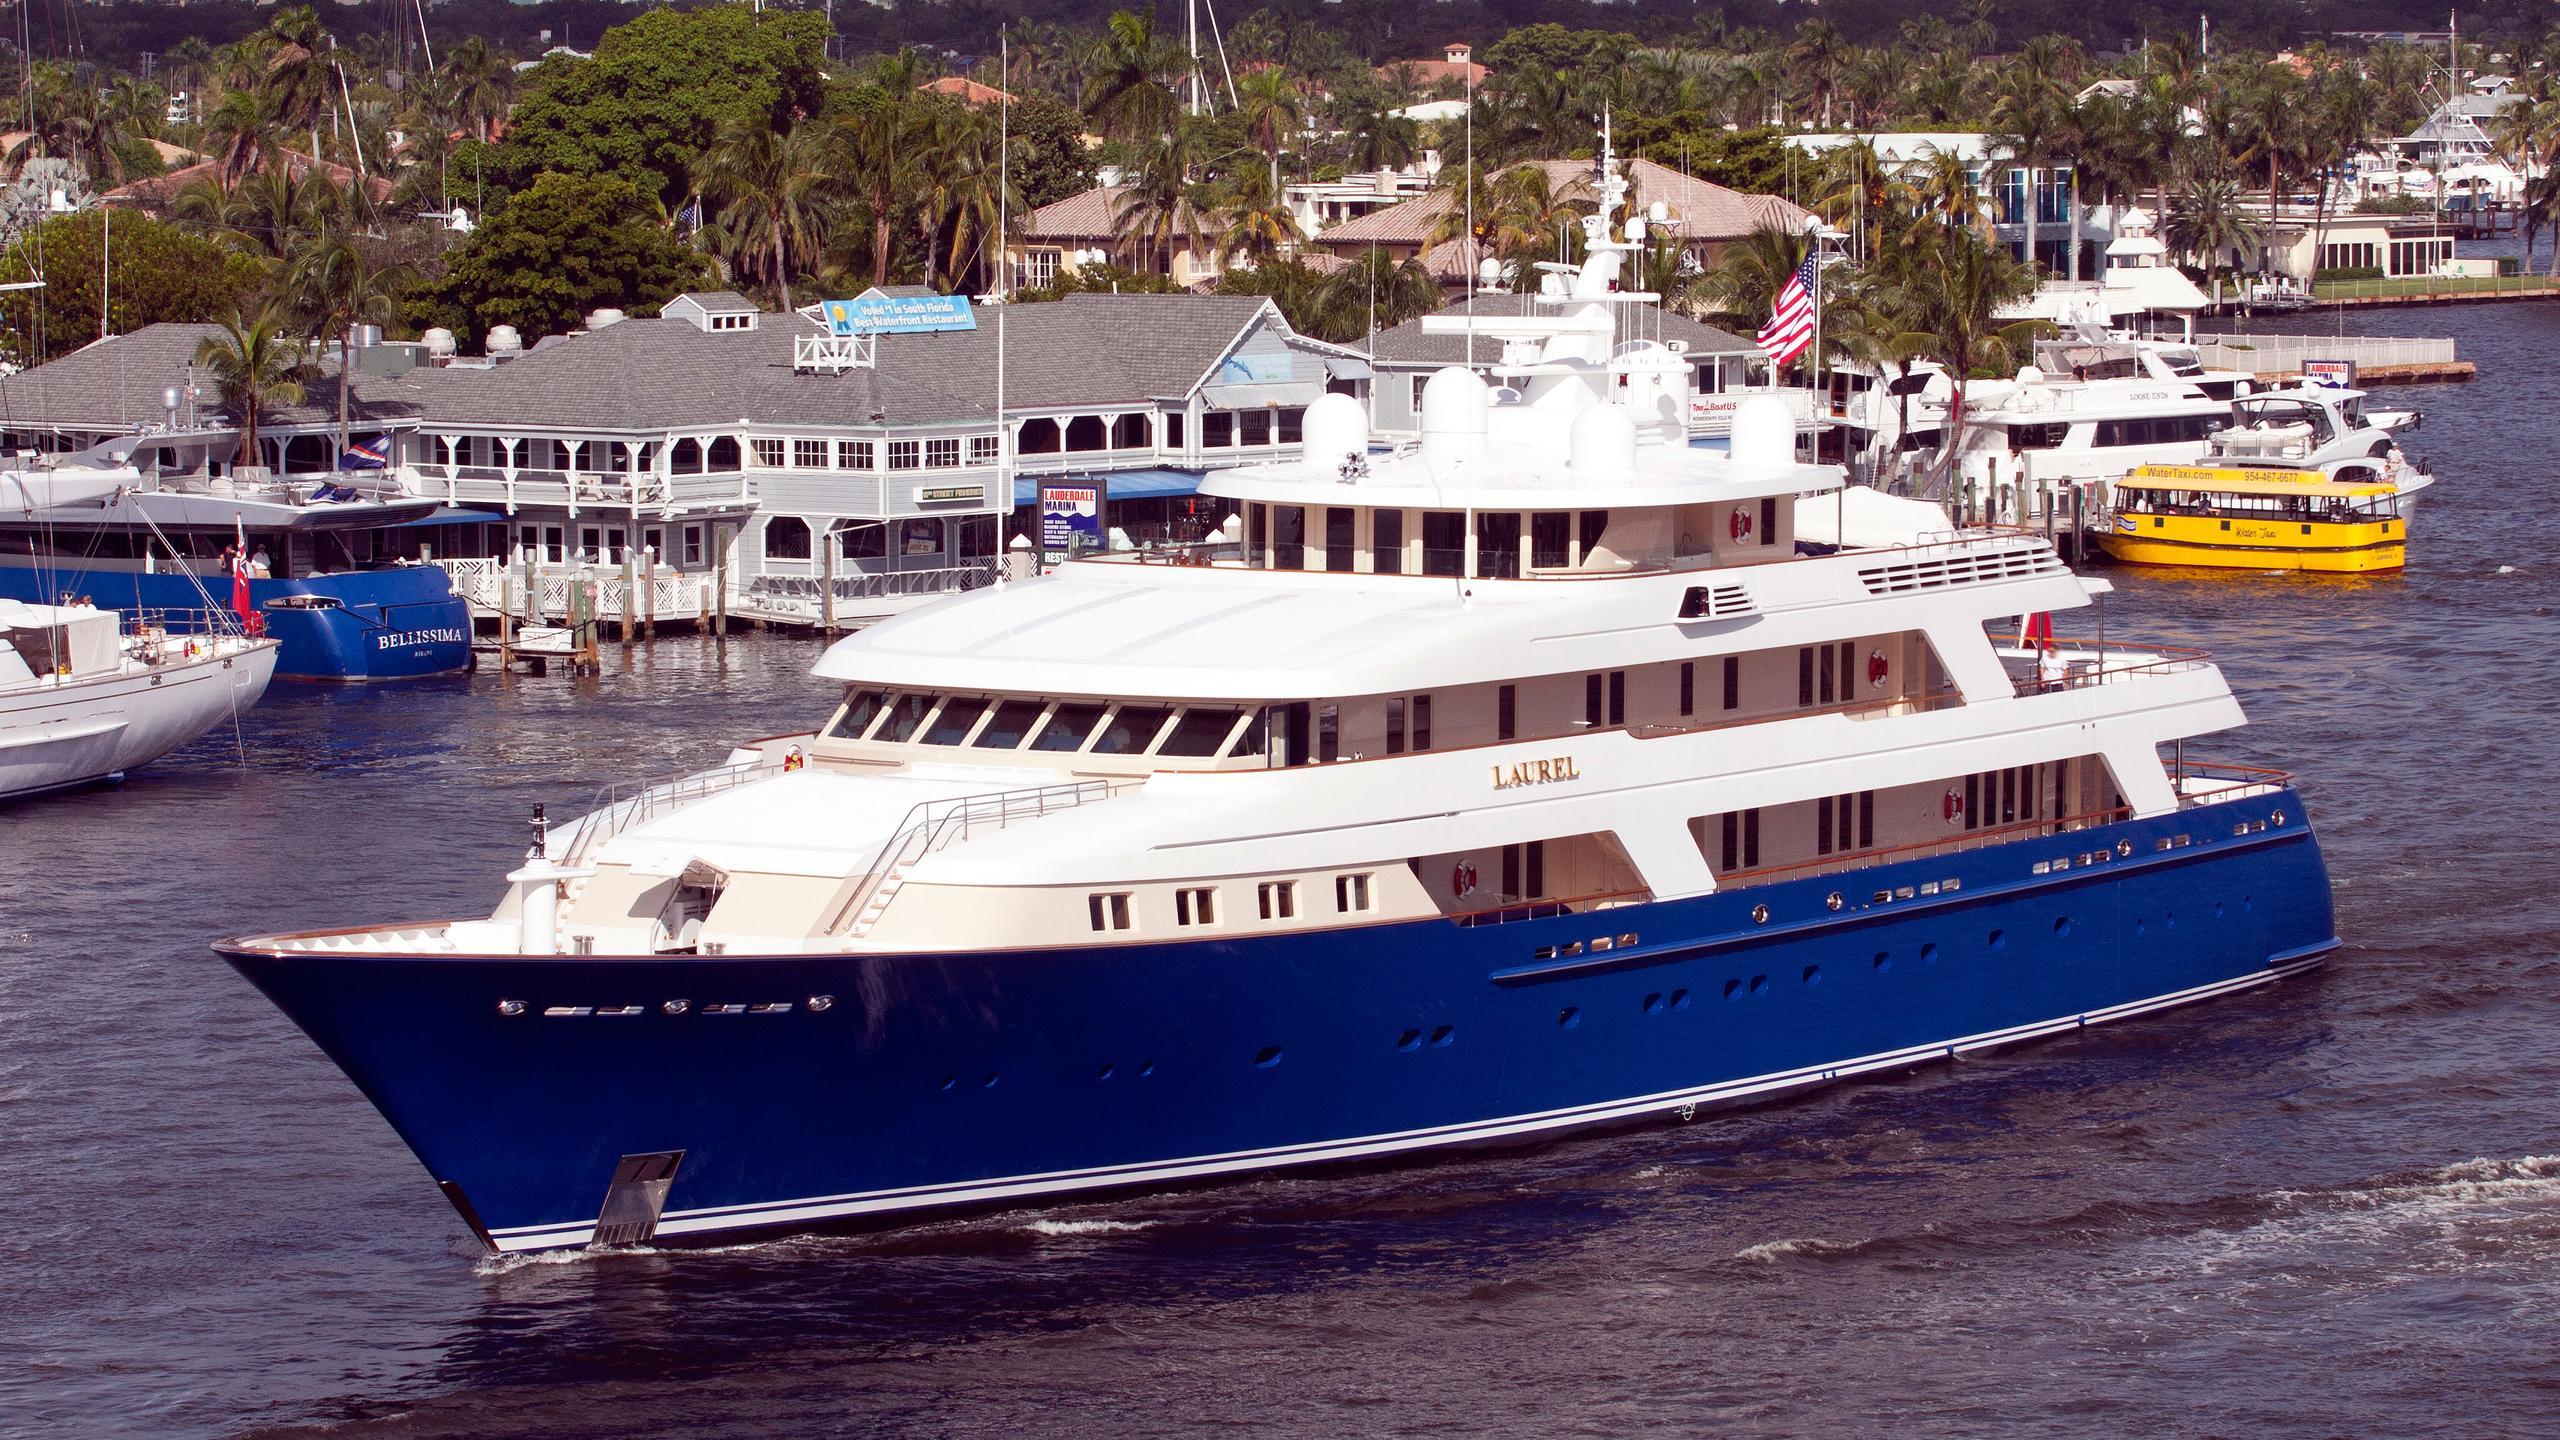 laurel-motor-yacht-delta-marine-2006-73m-half-profile